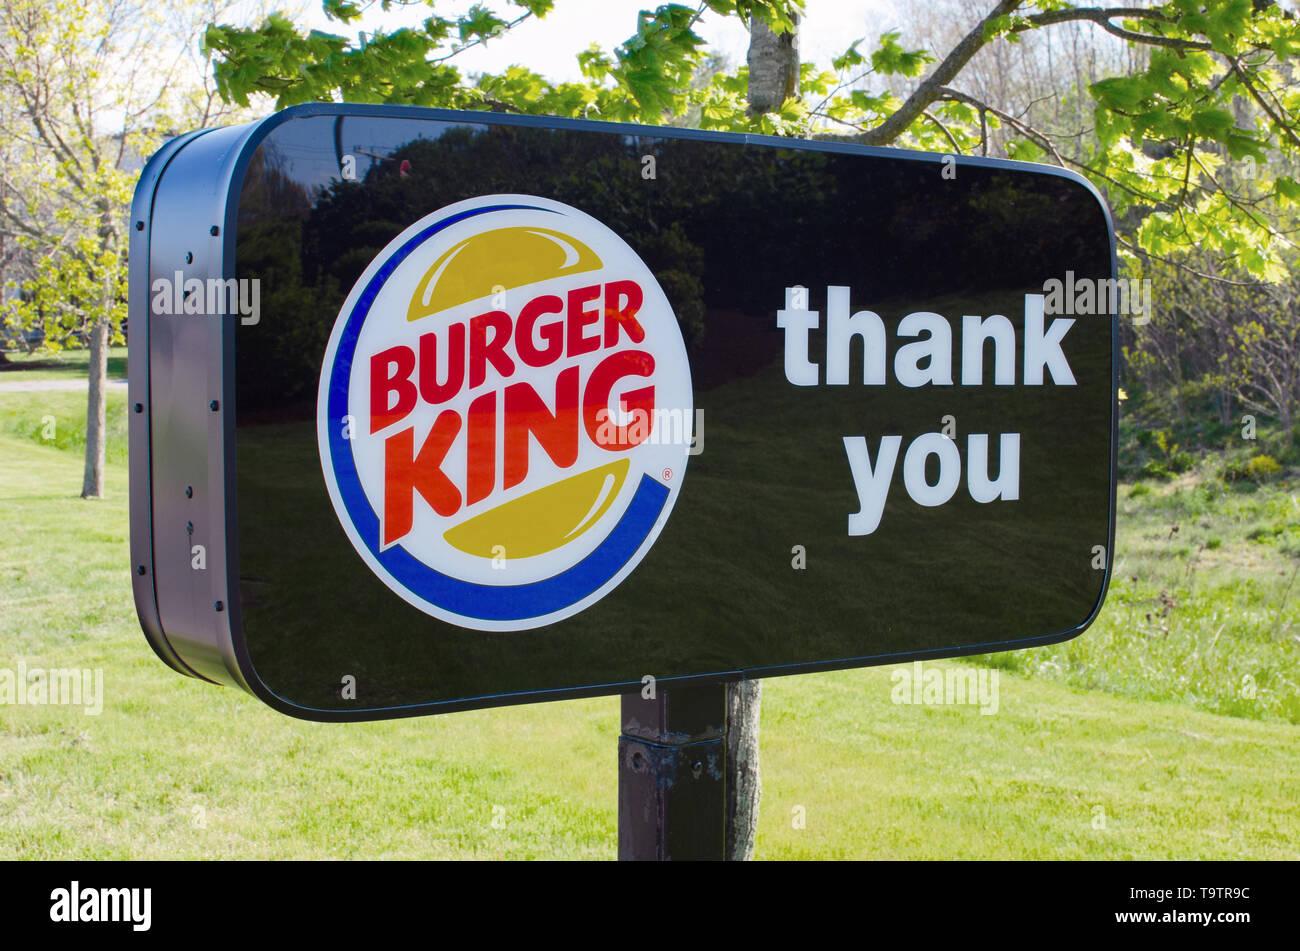 Burger King Thank You sign - Stock Image